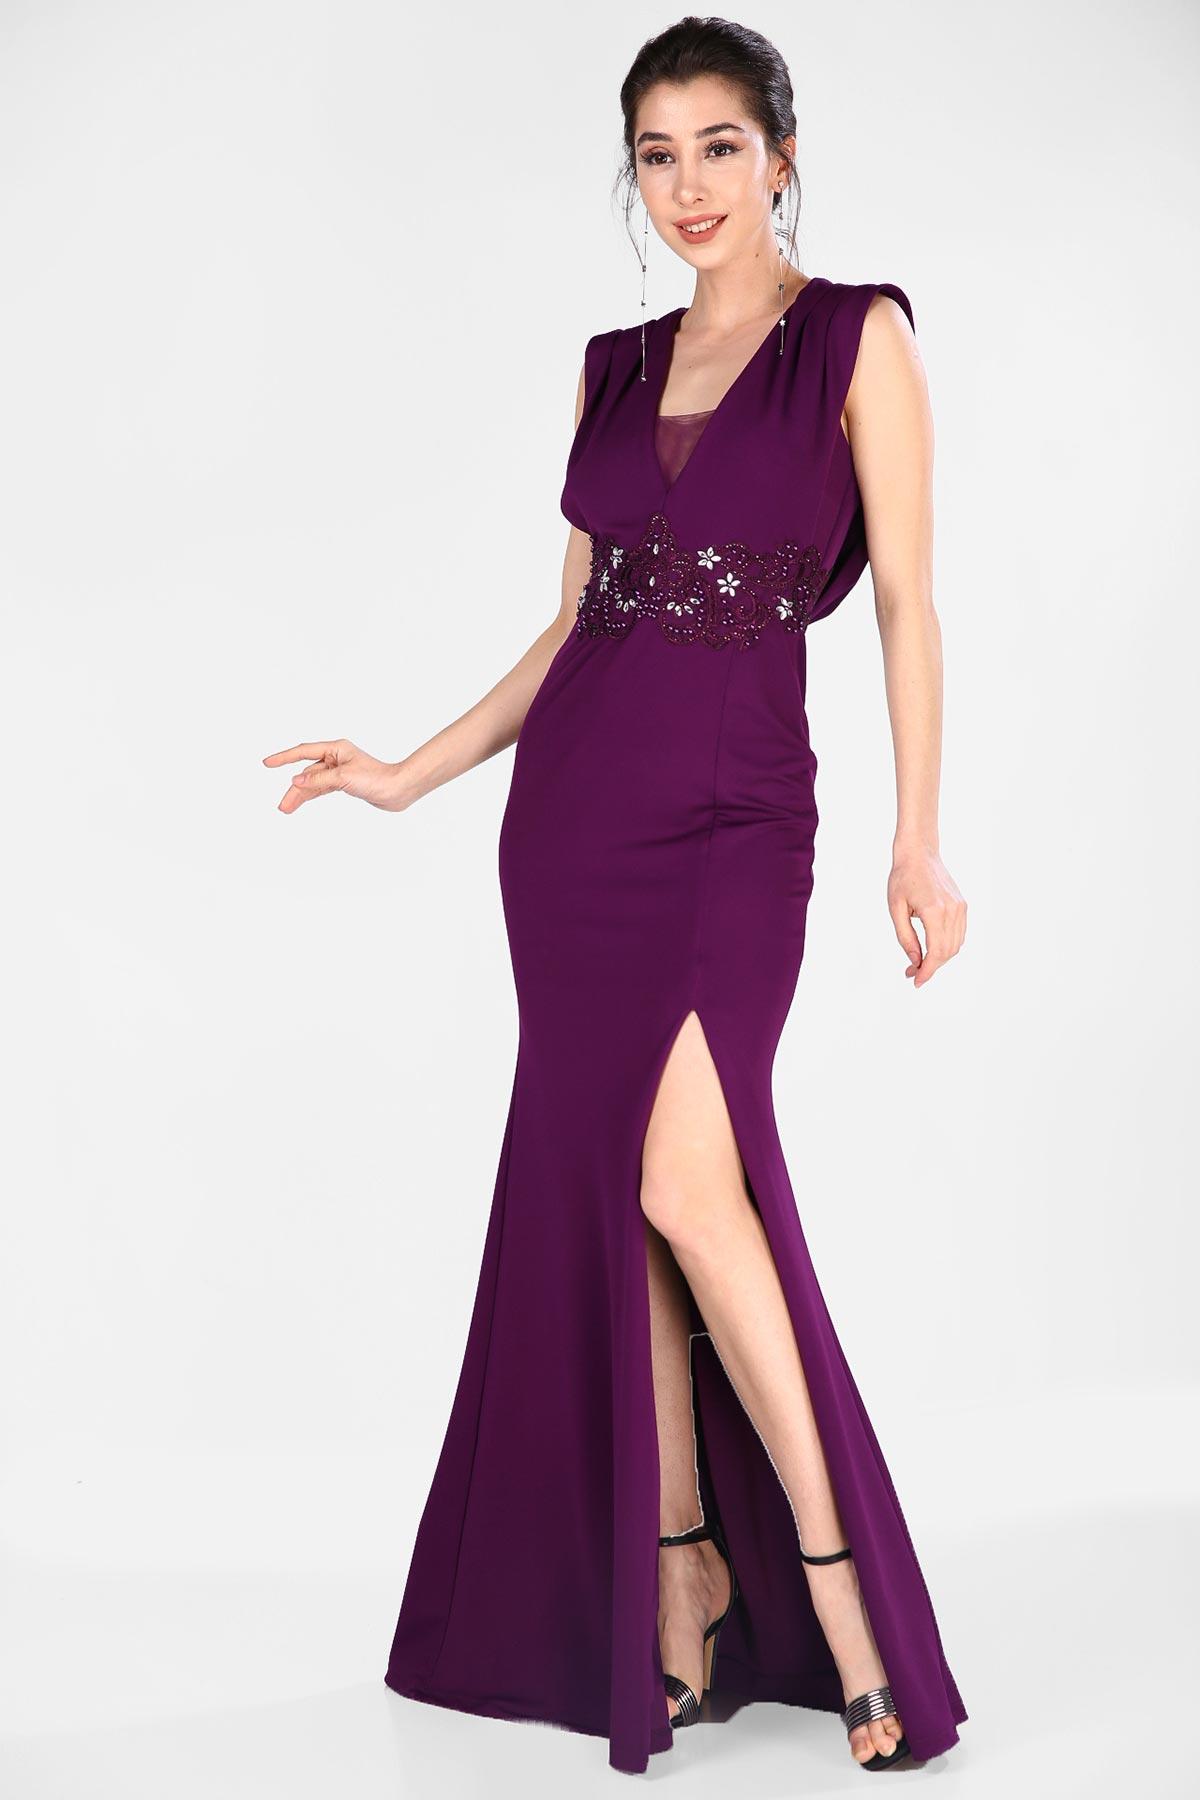 Women's Pearl Fish Model Purple Evening Dress